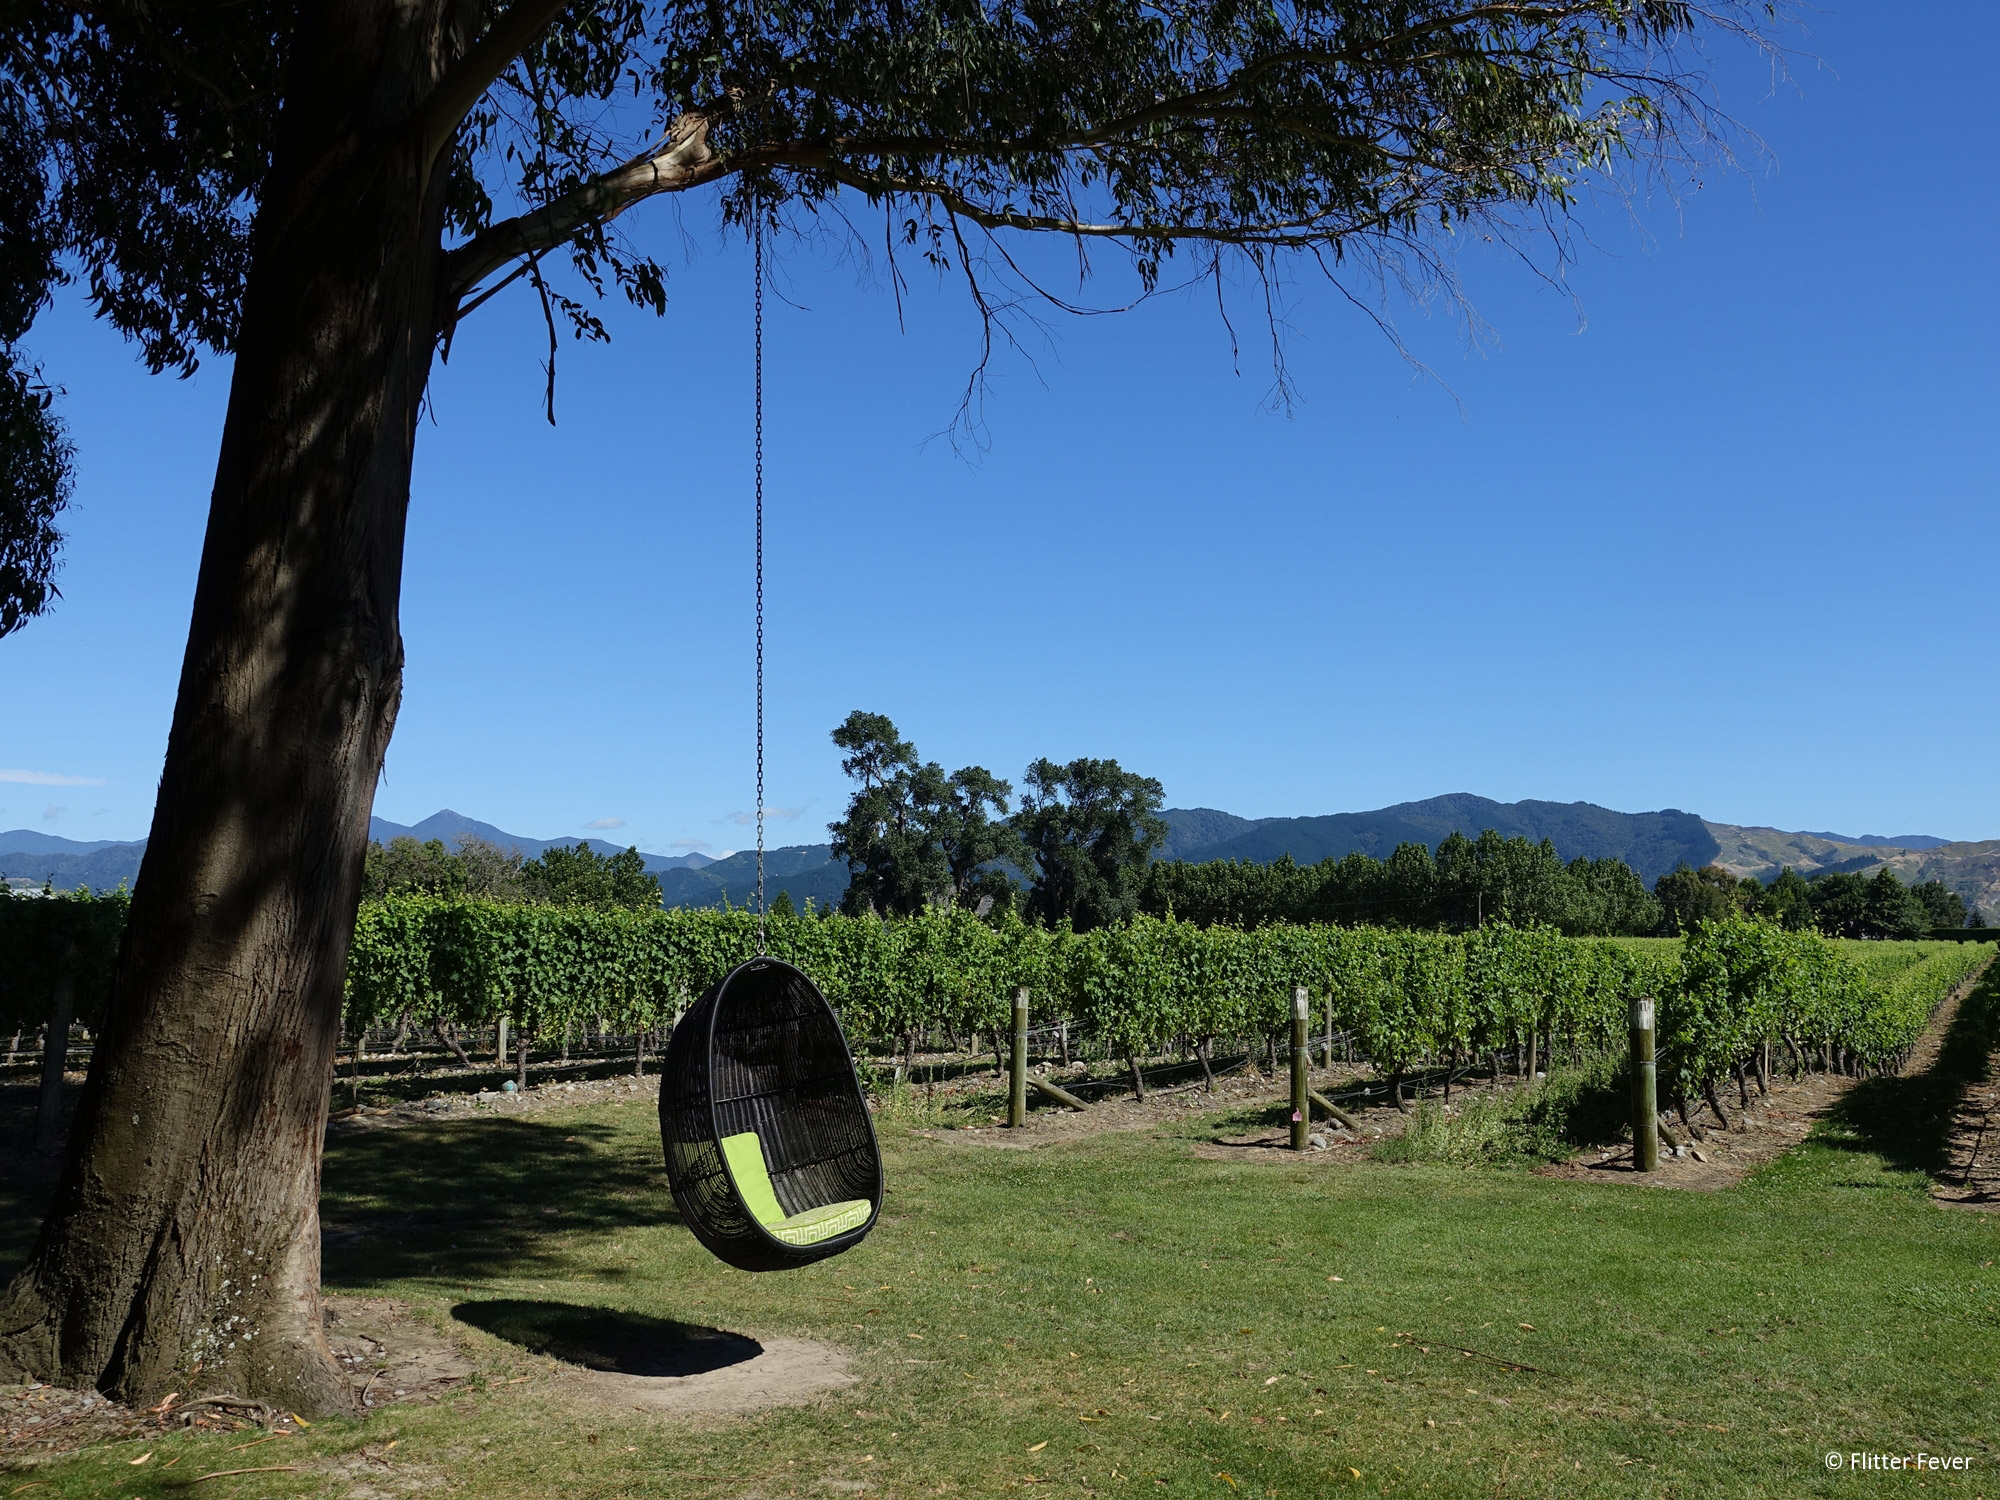 Flitter Fever - Cloudy Bay vineyard Blenheim in Nieuw-Zeeland